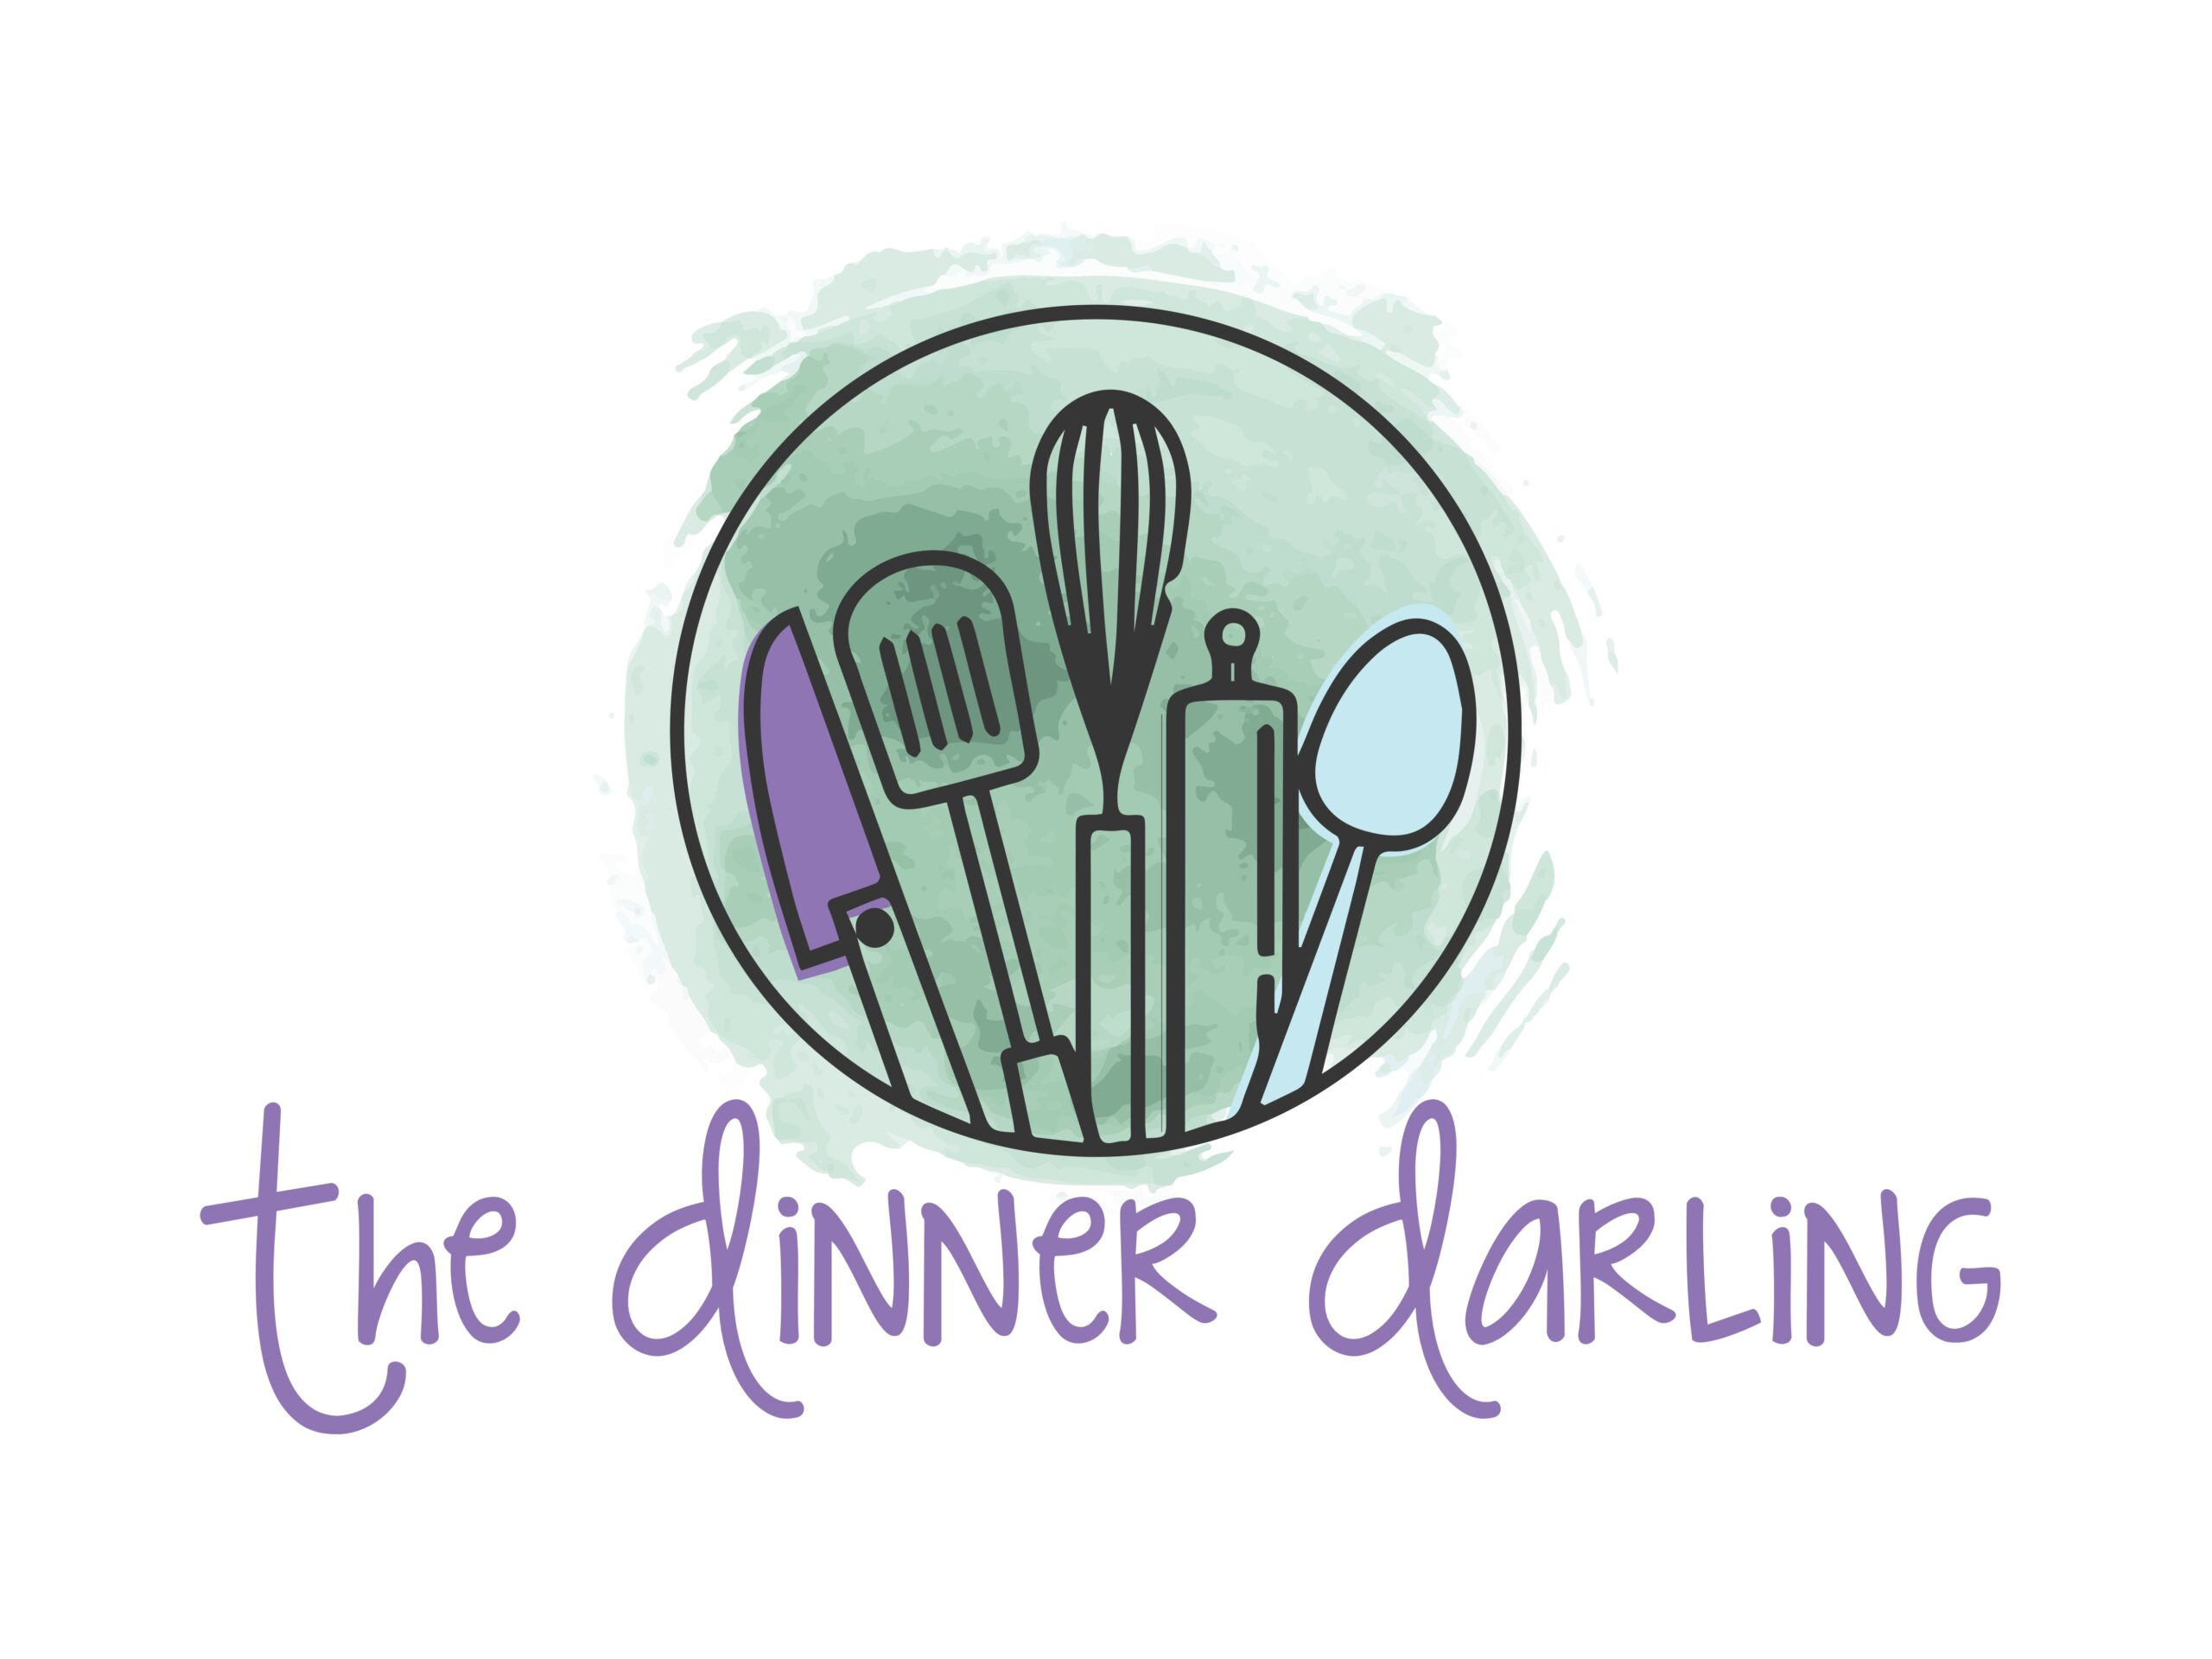 The Dinner Darling